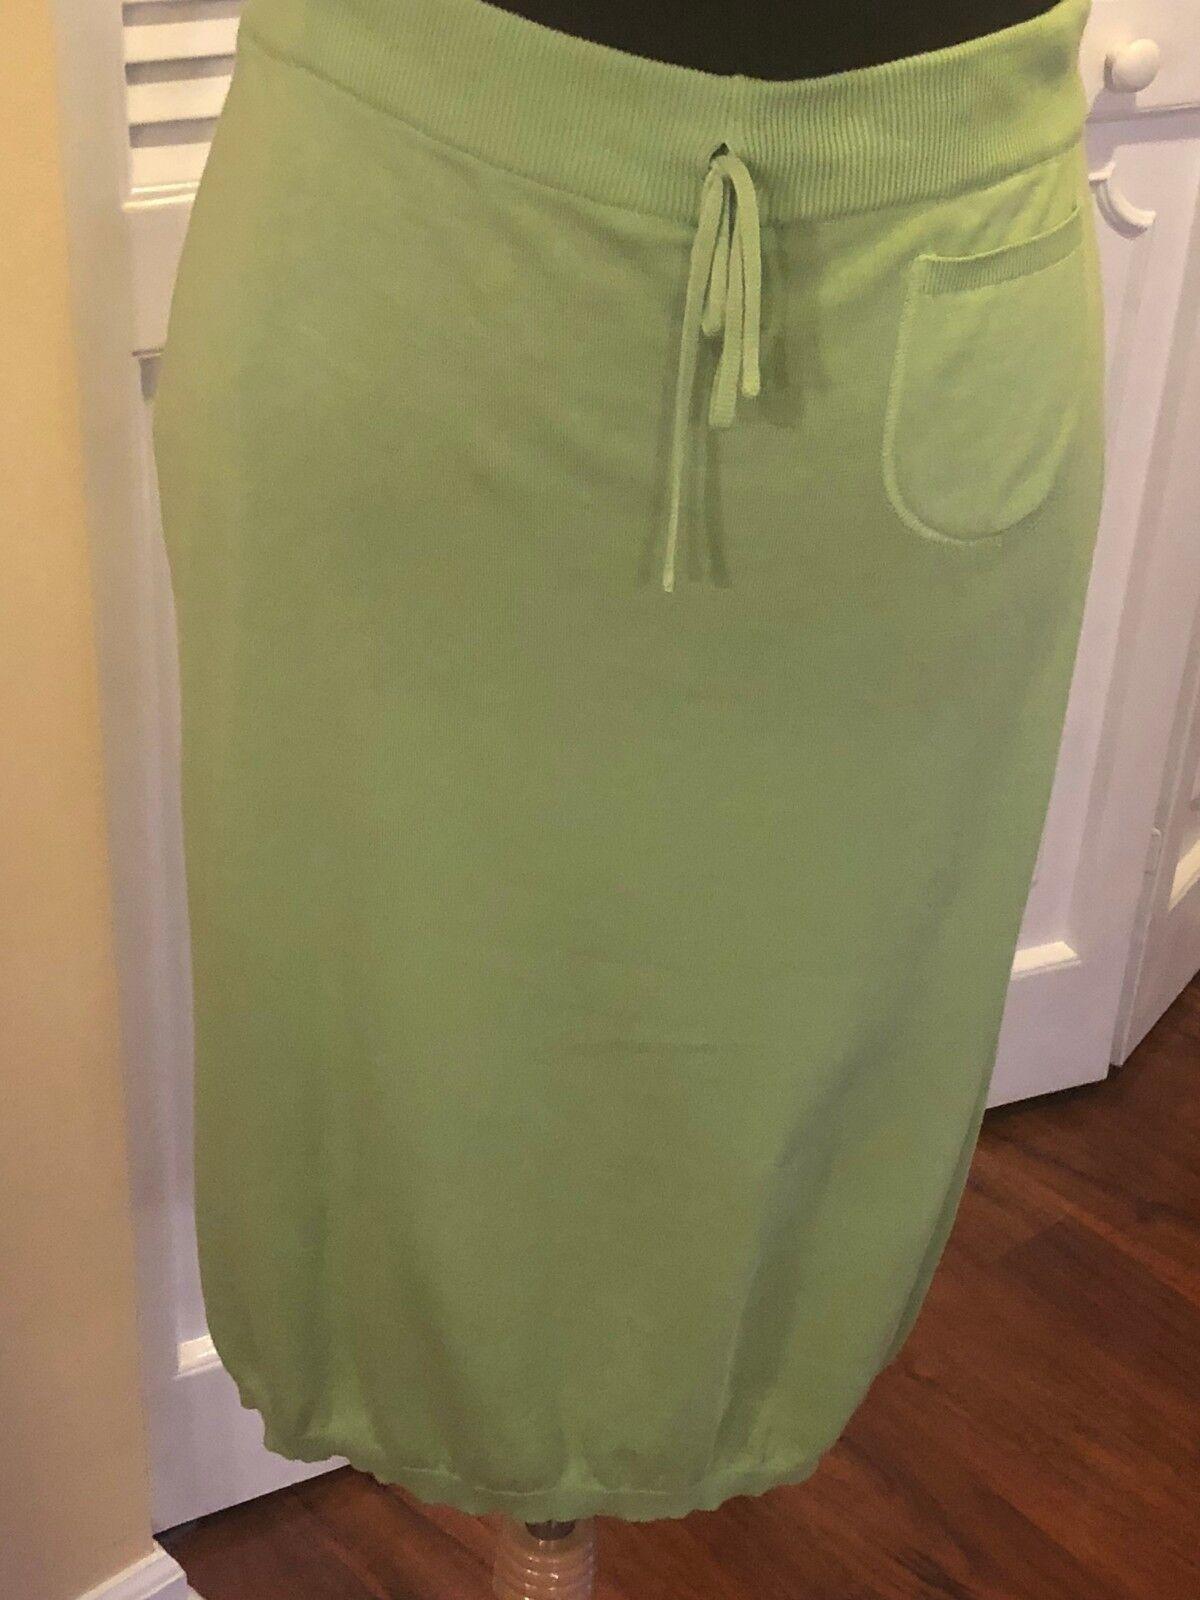 Malo Green Cotton Knit Skirt NWT - Size 46